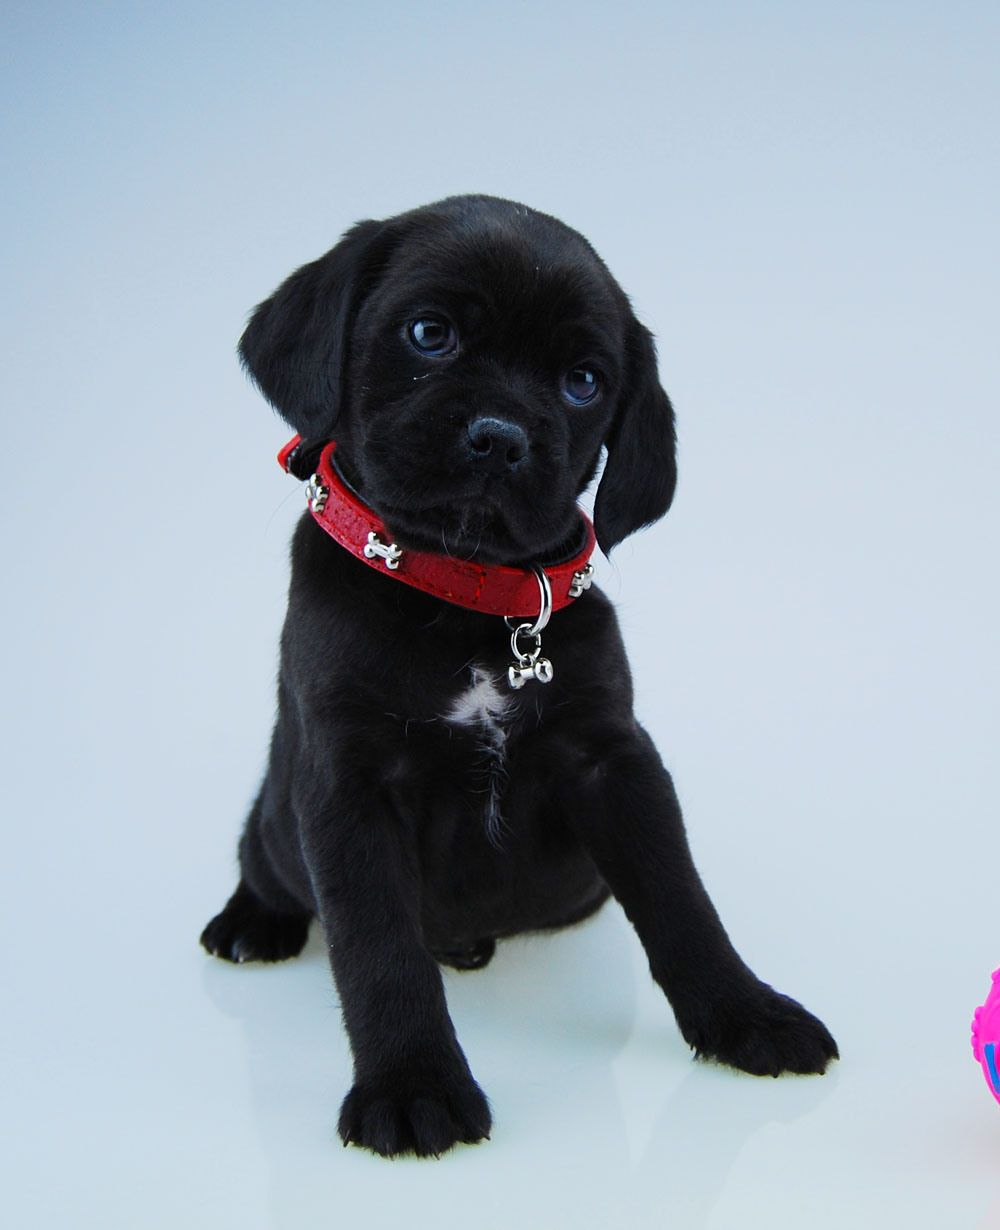 Black Puggle Full Grown Google Search Black Puggle Puggle Dogs